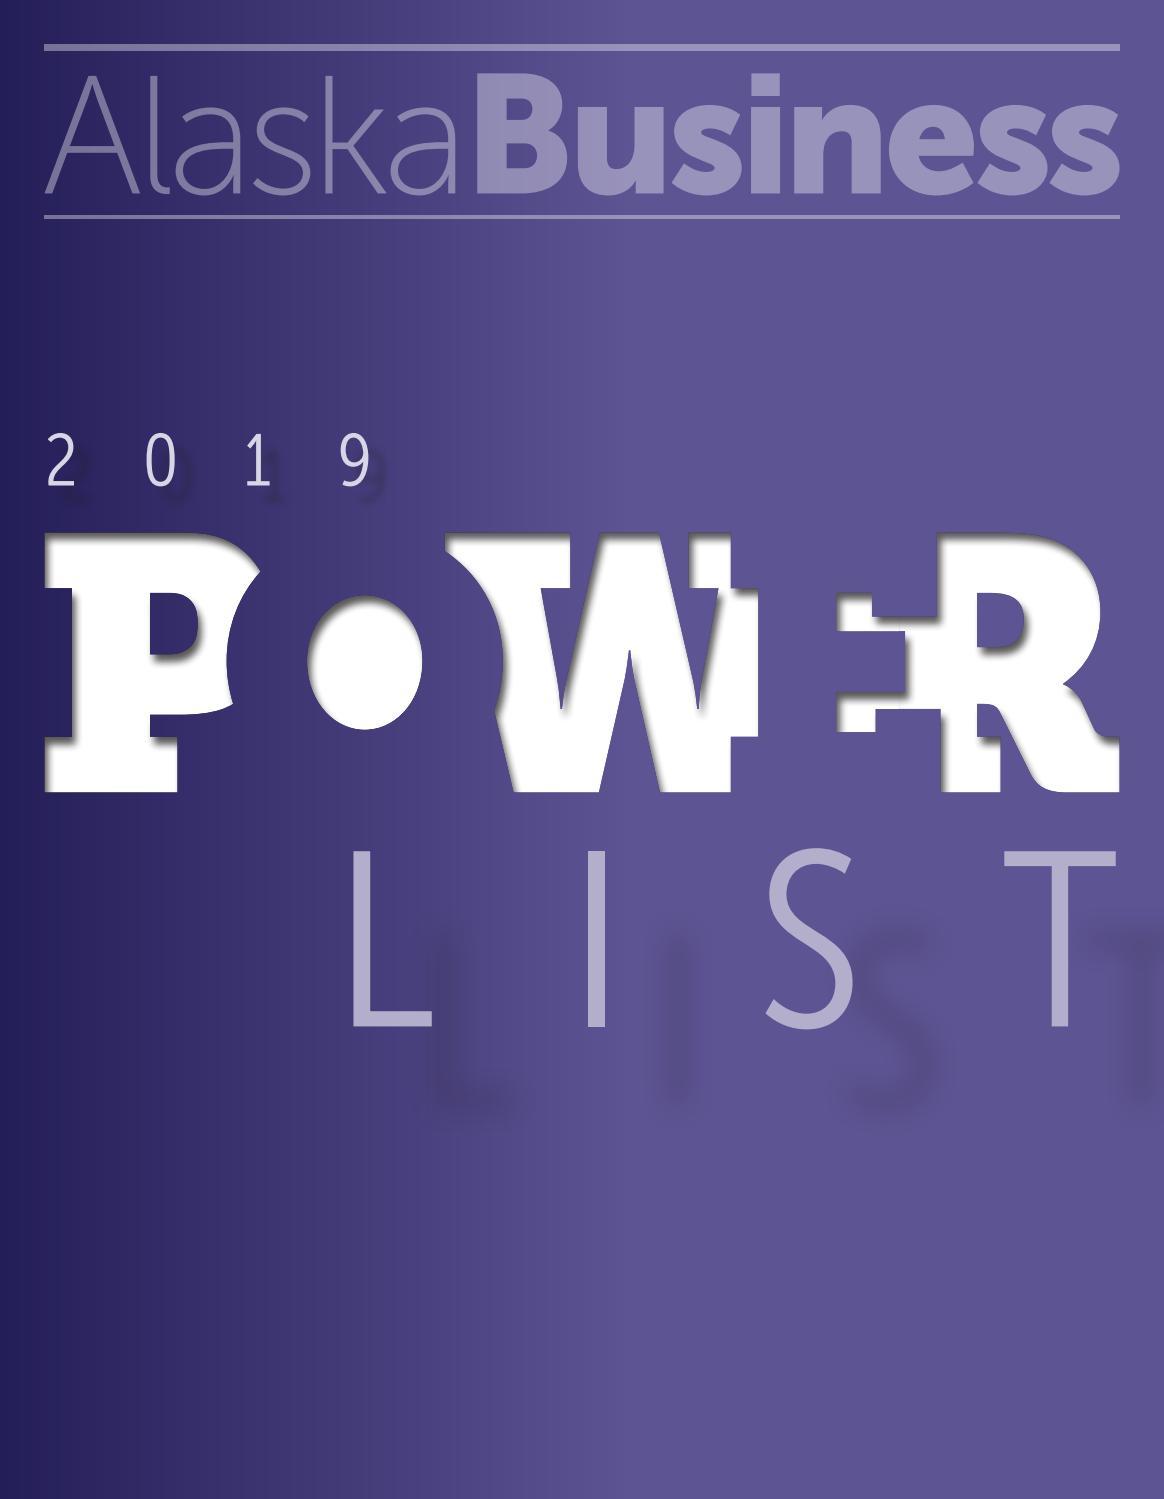 1300 E 223rd Street No 409 Carson California Map.2019 Power List By Alaska Business Issuu